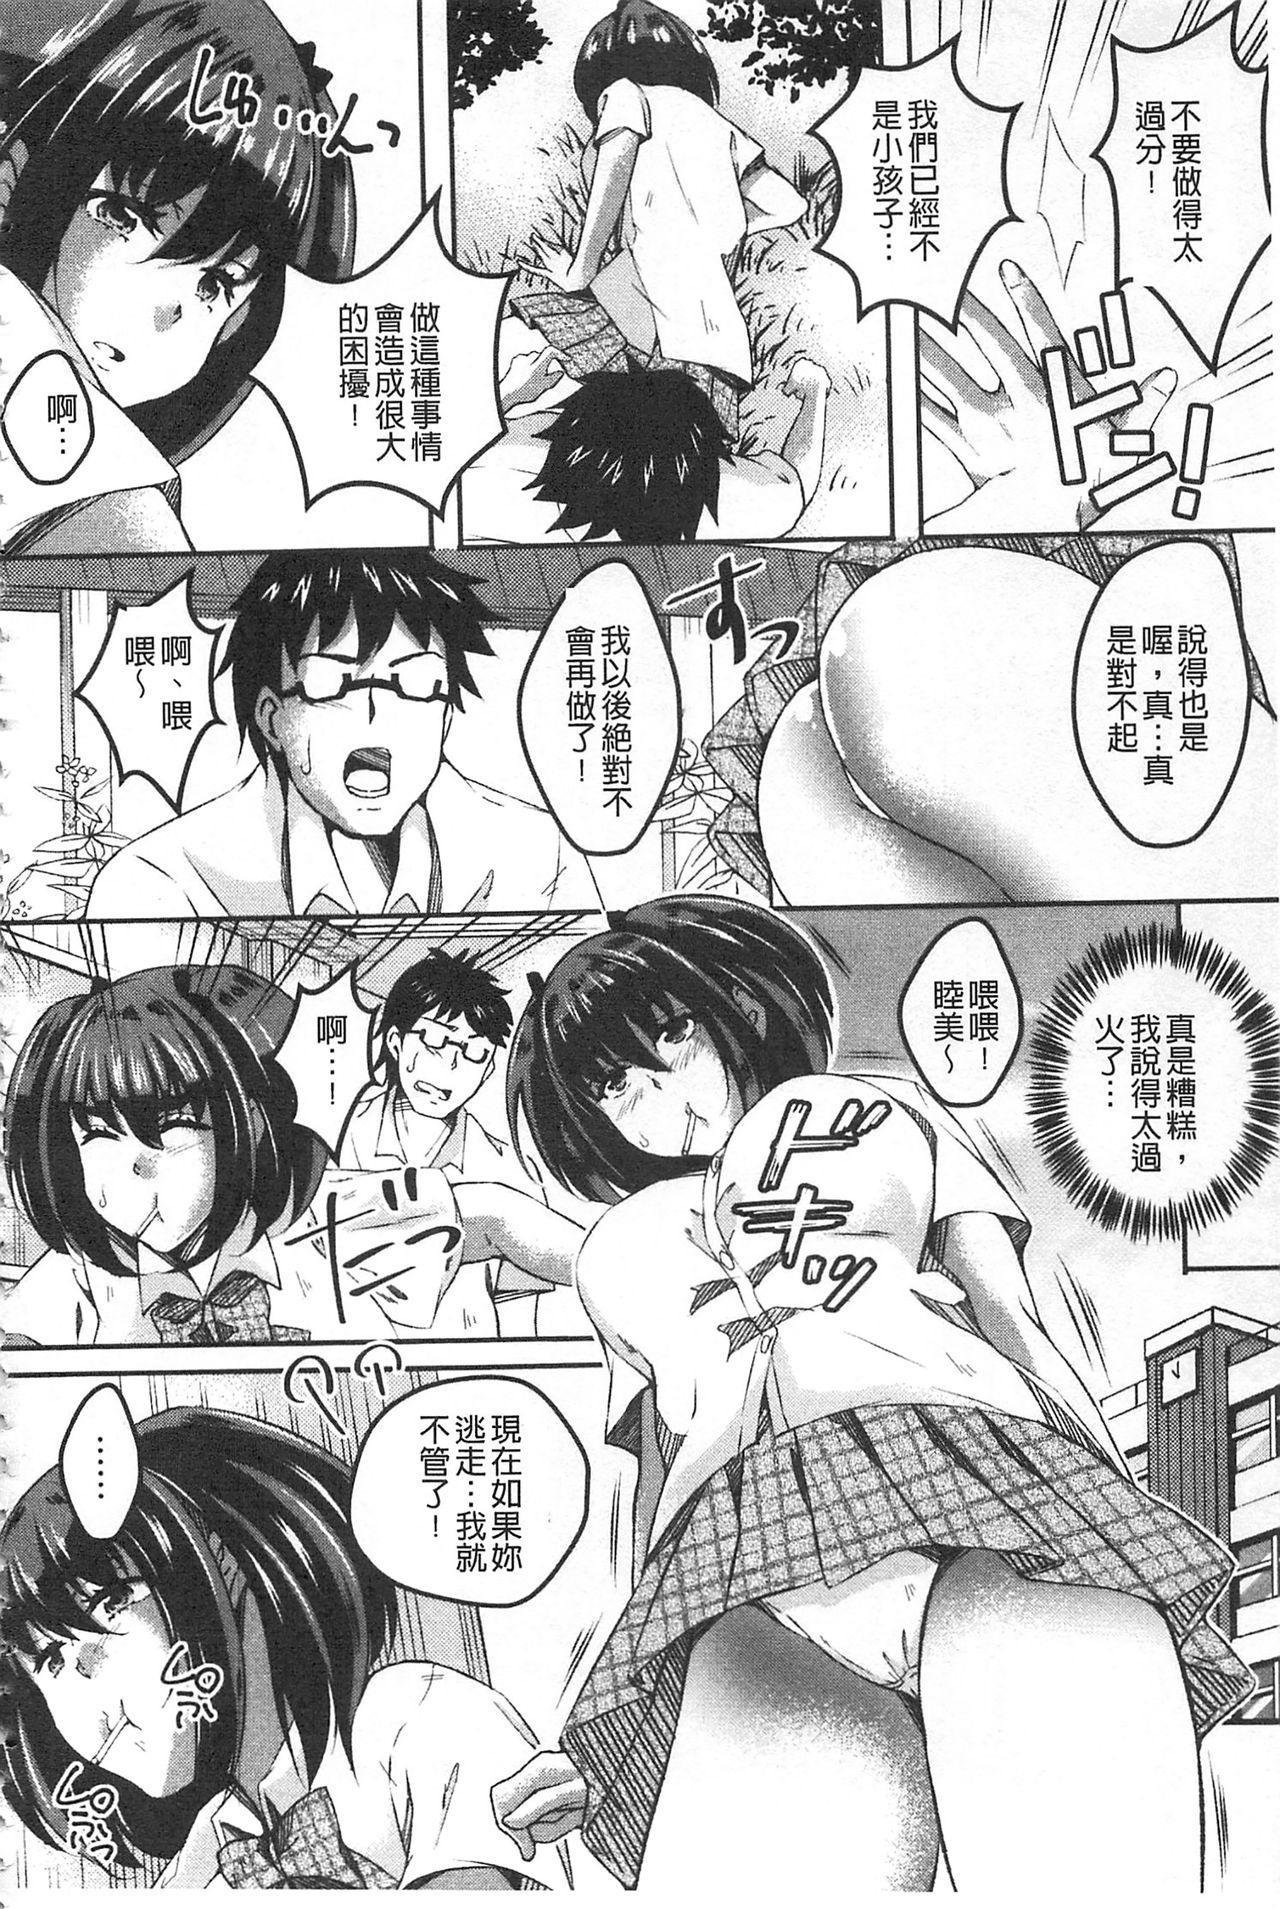 Kanjuku Otome no Odoshikata | 姦熟乙女的脅迫法 103